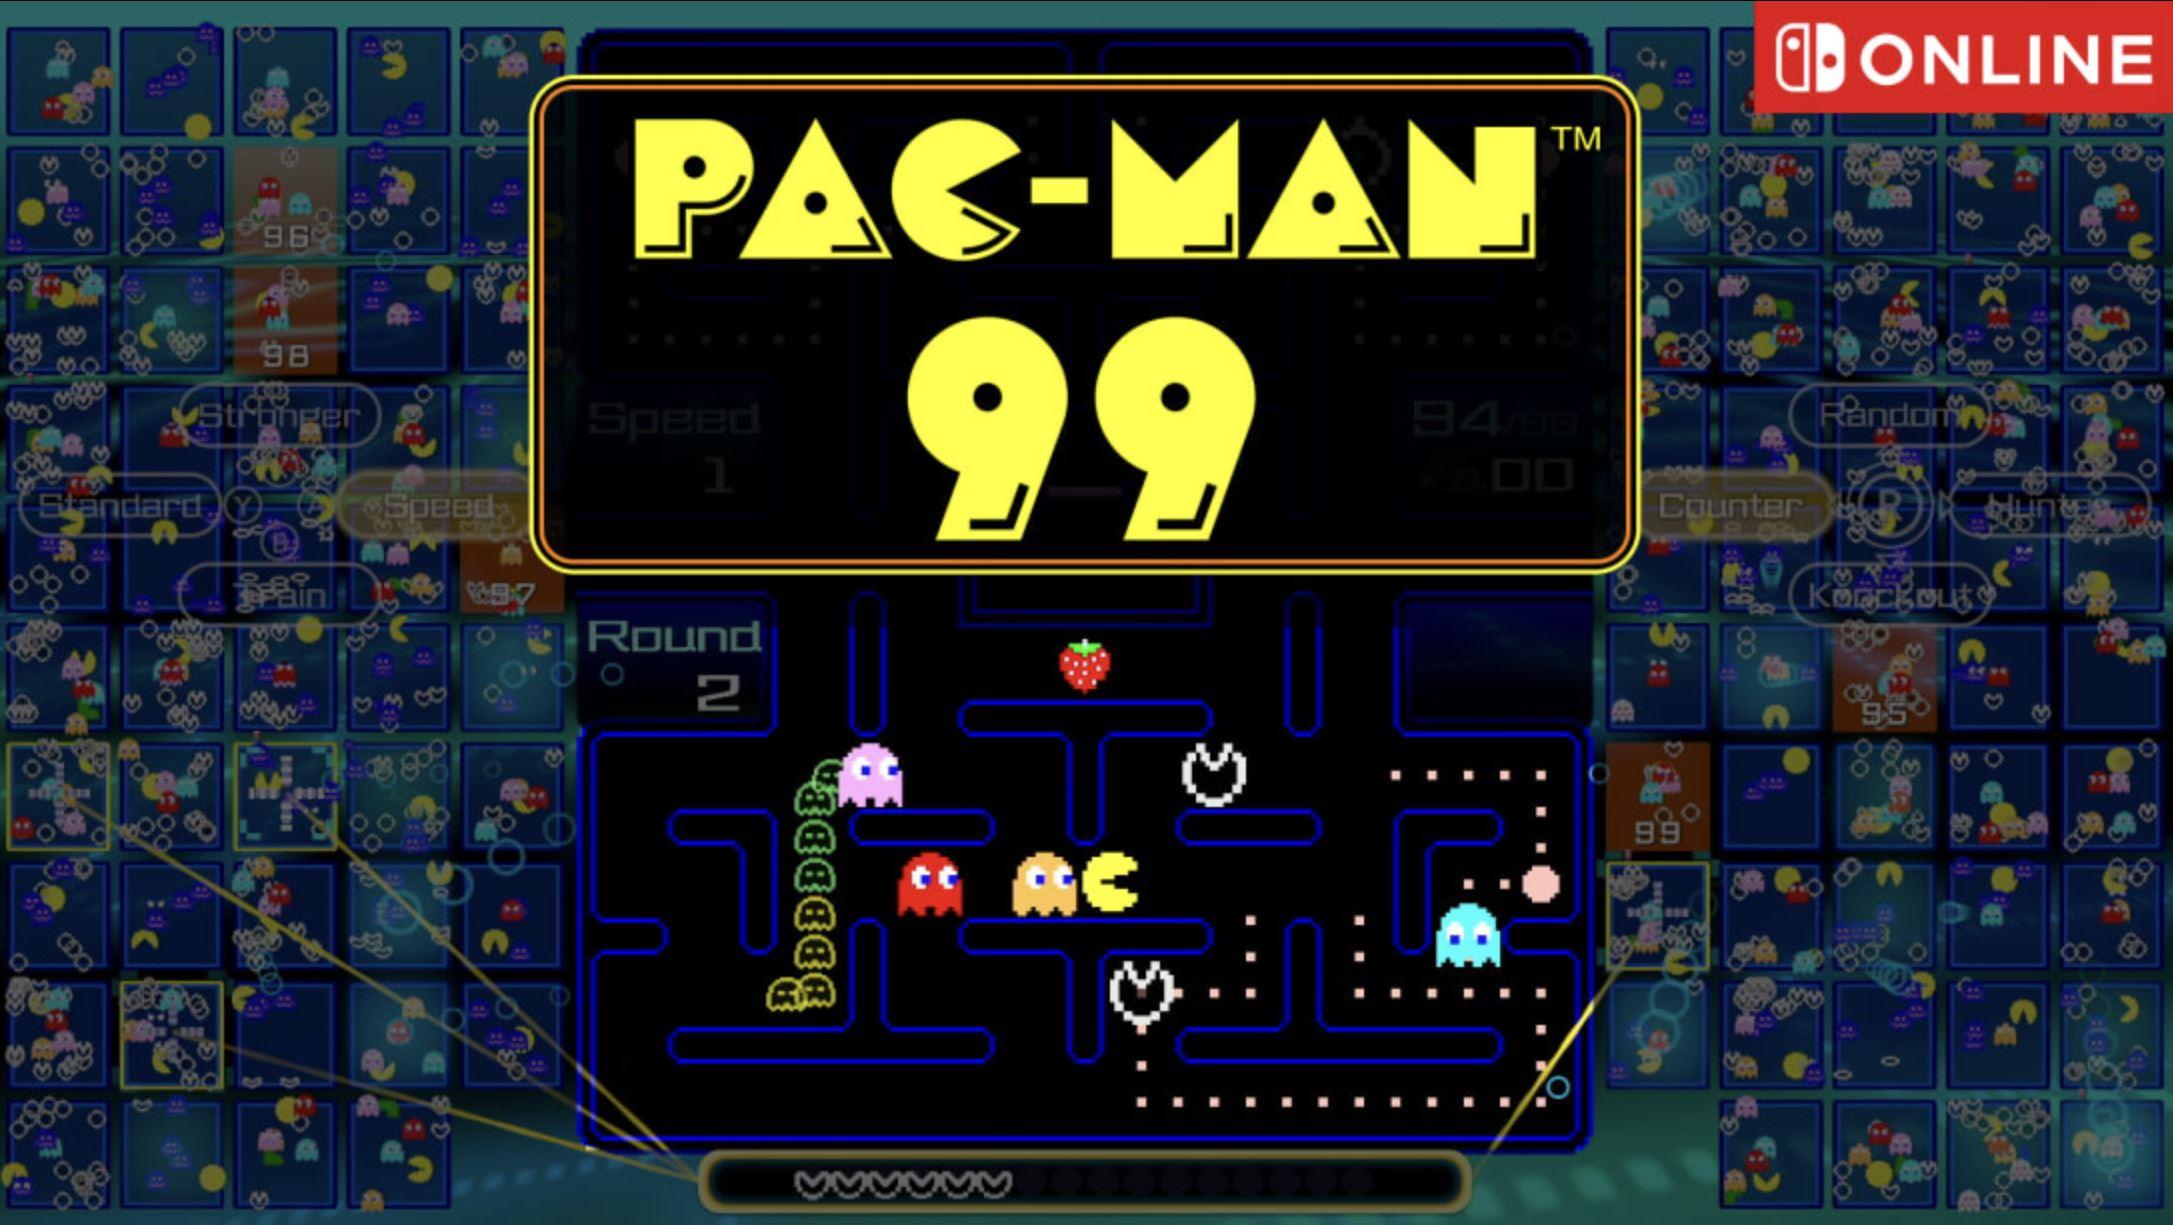 pacman99 - nintendo download